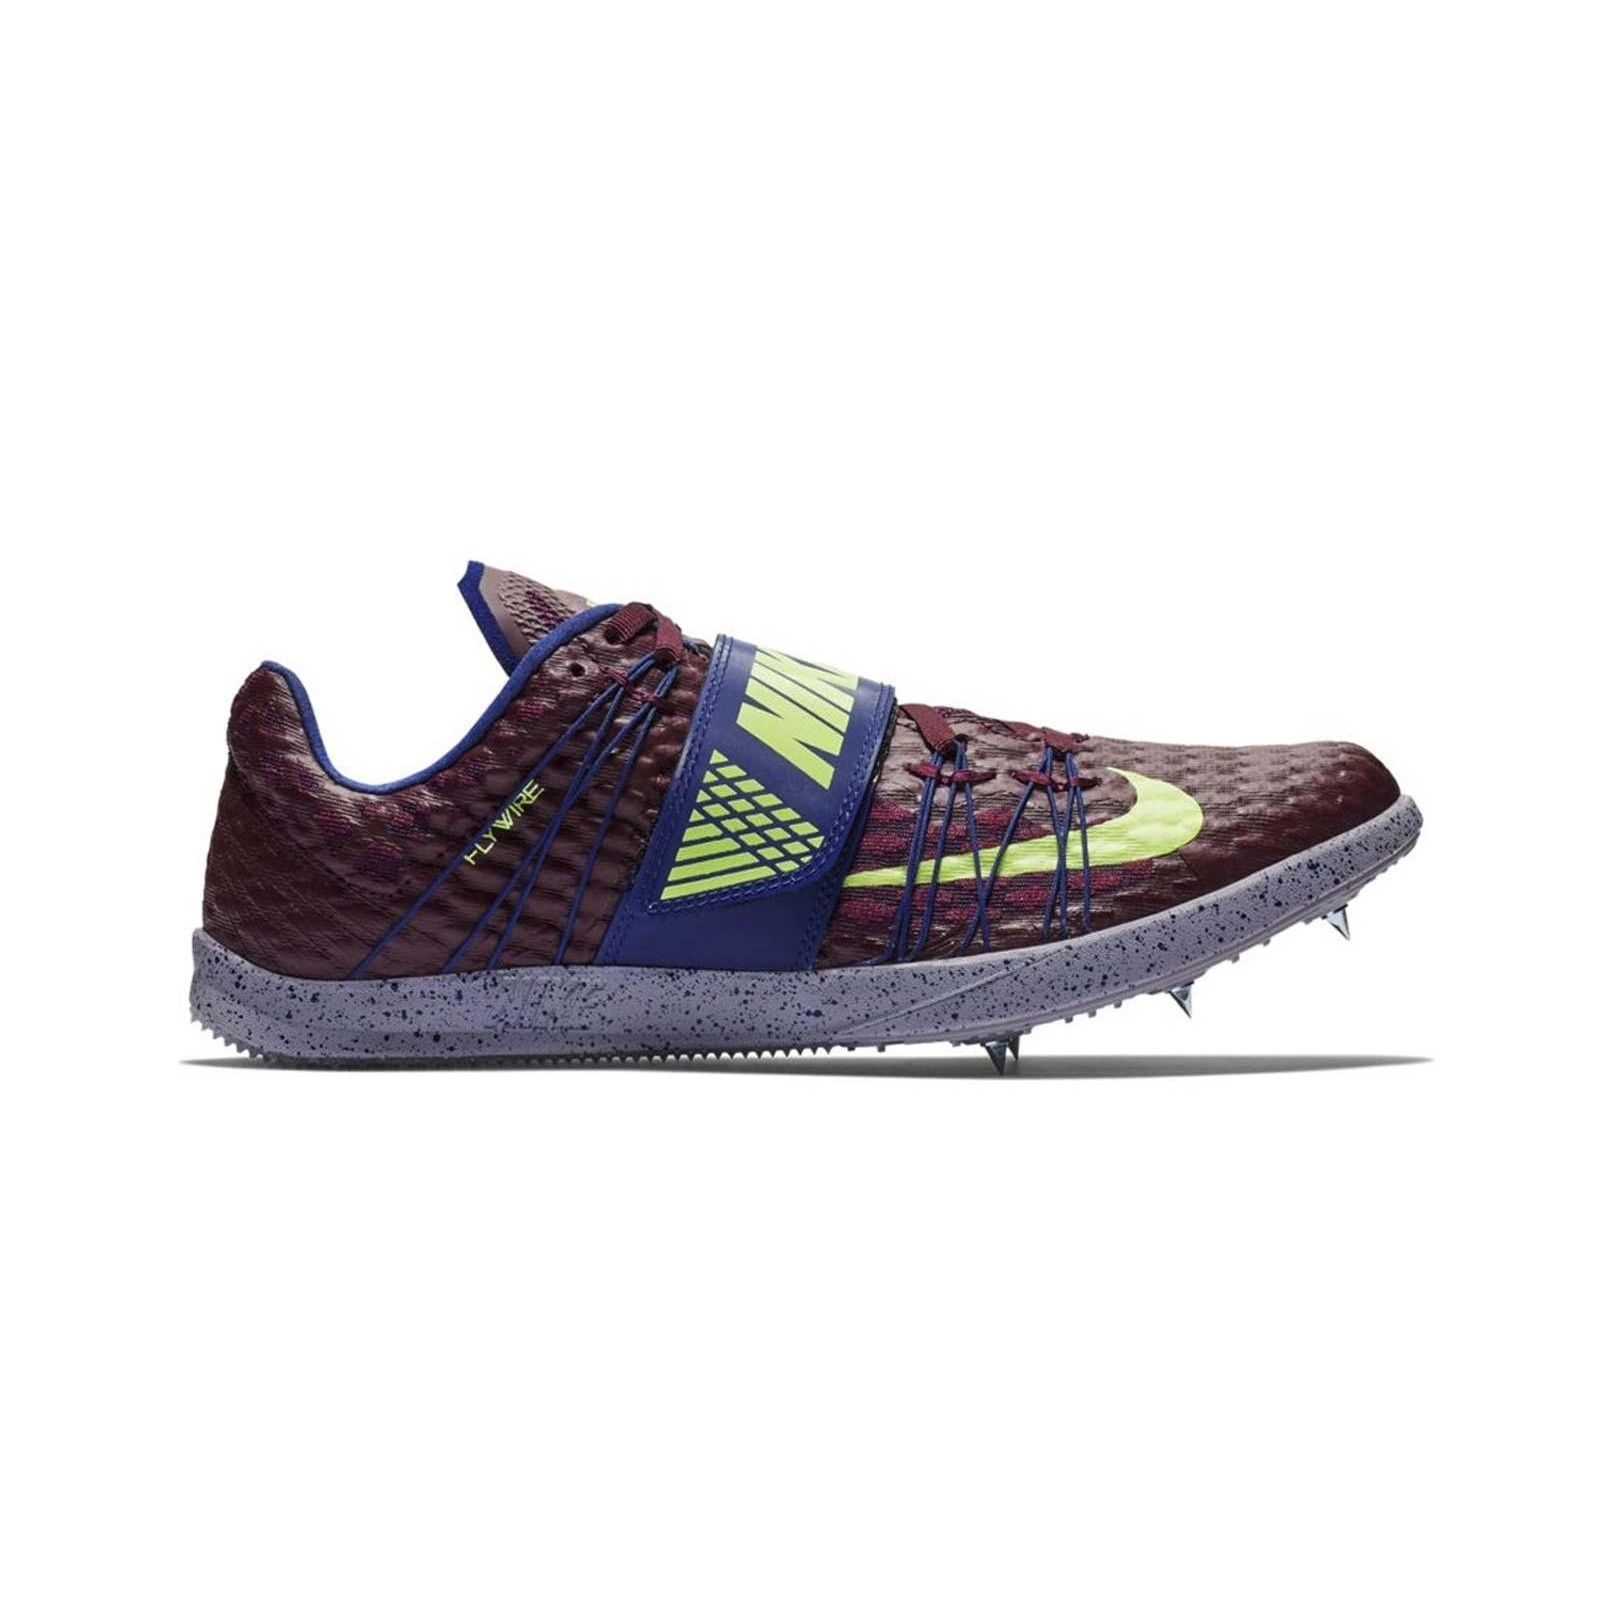 hot sales 1fcdb 4a192 Nike-TJ ELITE. NIK705394600